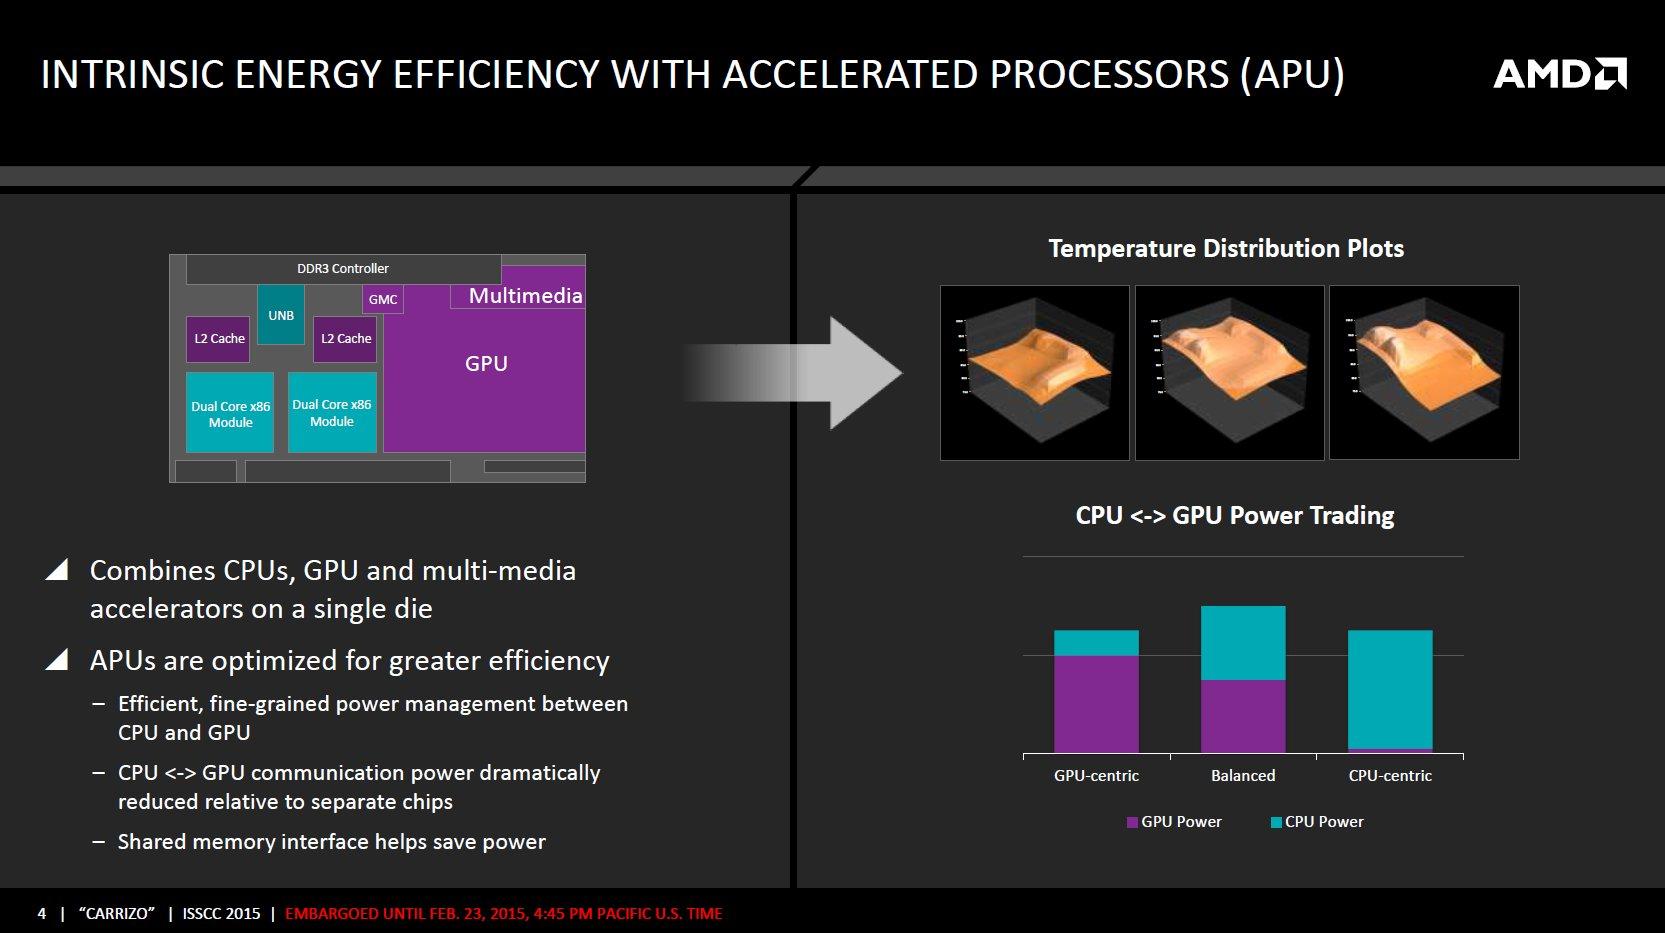 APU-Vorteile laut AMD